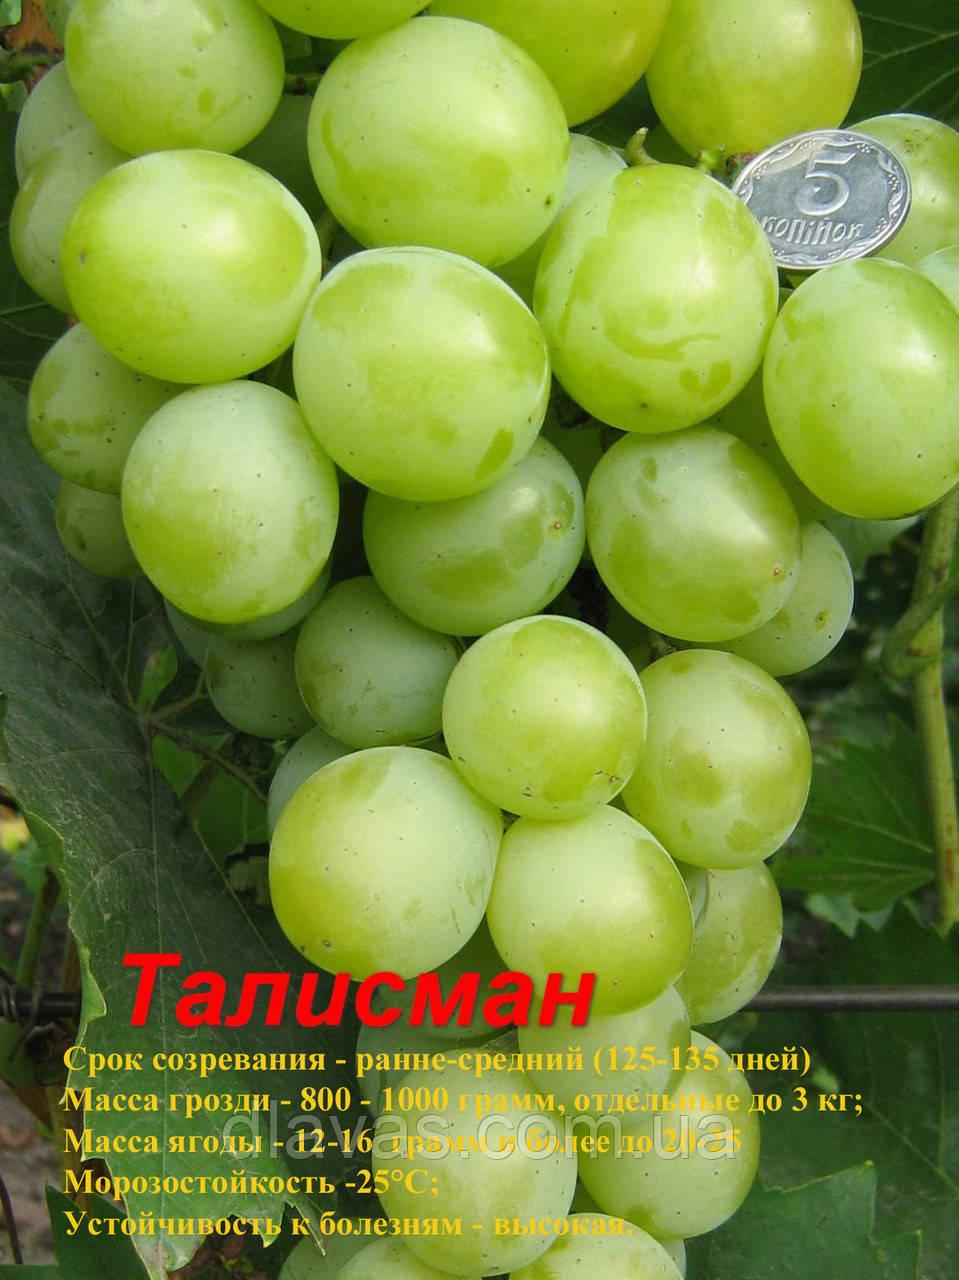 Виноград столовый Талисман (Кеша-1, Кеша мускат, Супер Кеша, Кеша-2) сорт ранний.